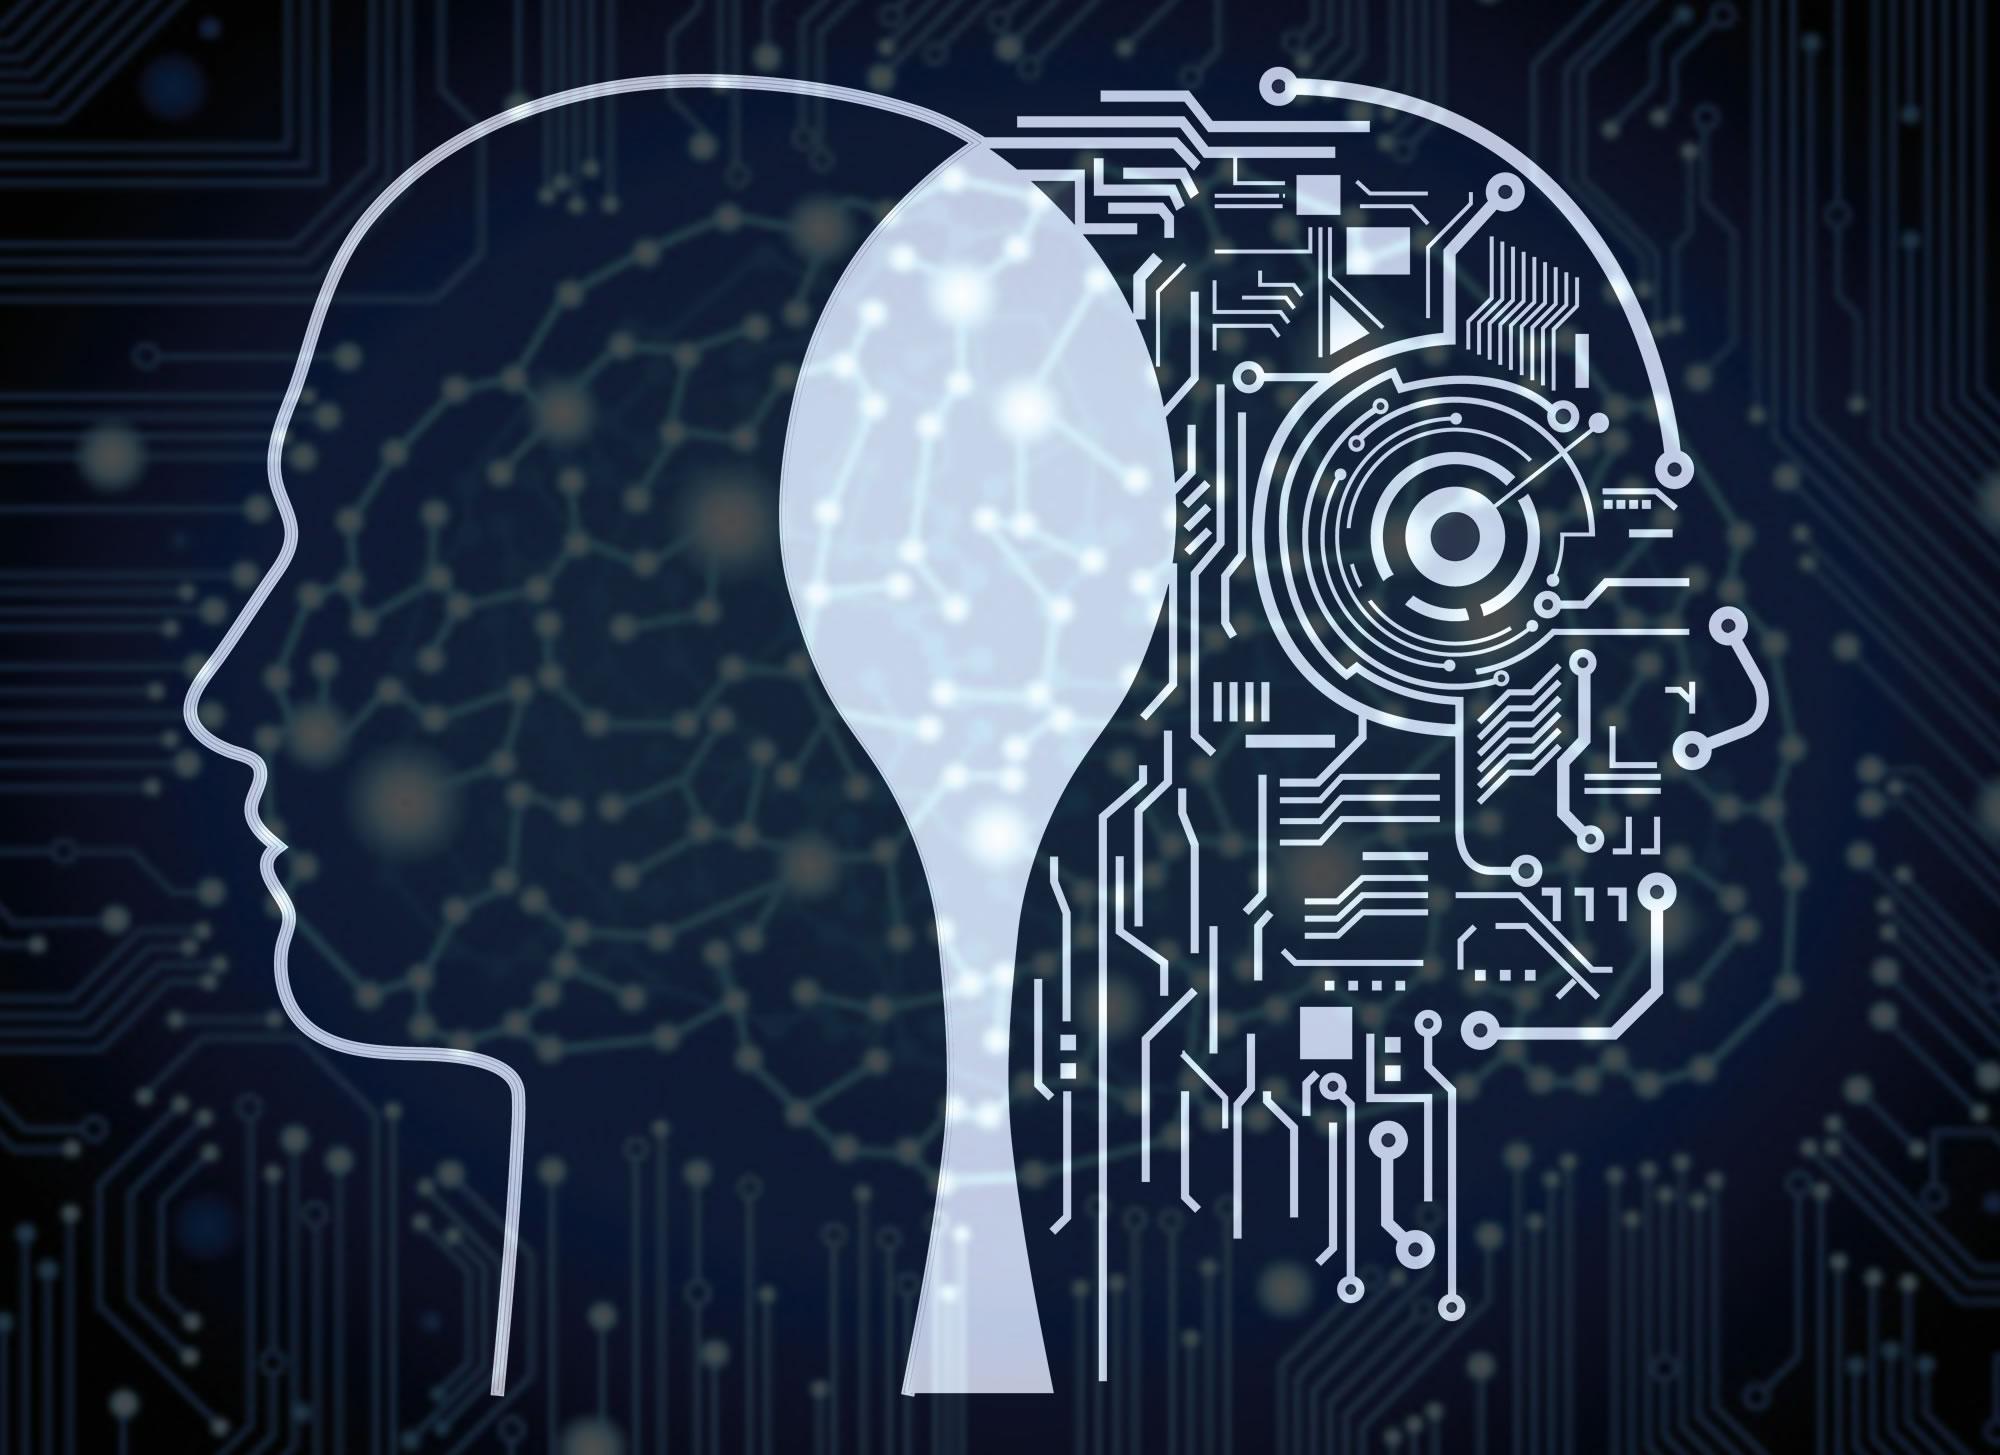 inteligencia-artificial-03.jpg